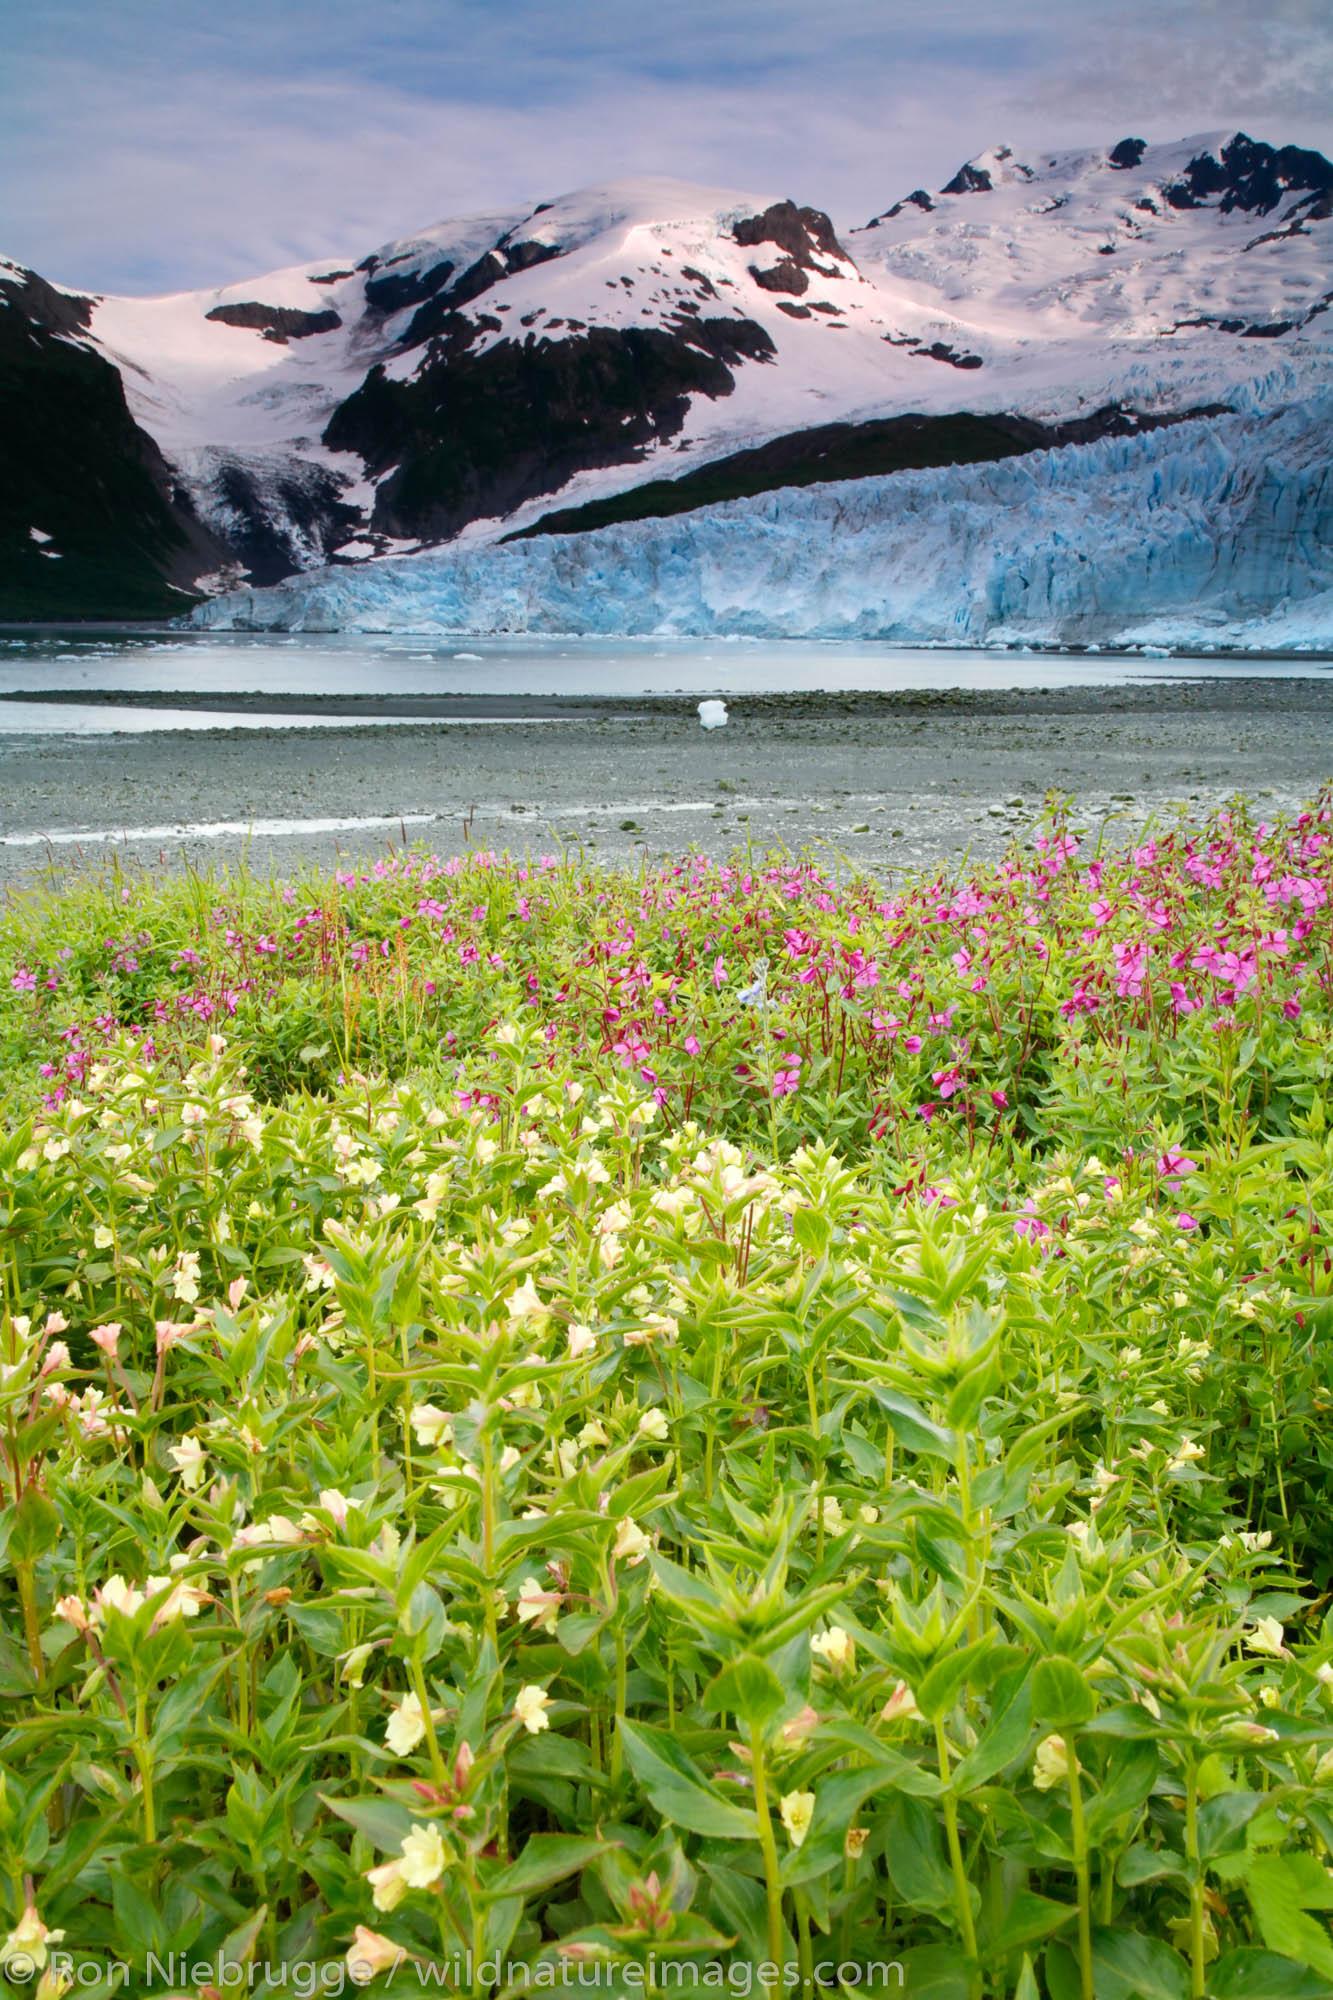 Chugach National Forest, Alaska Chugach, Harriman Glacier, photo